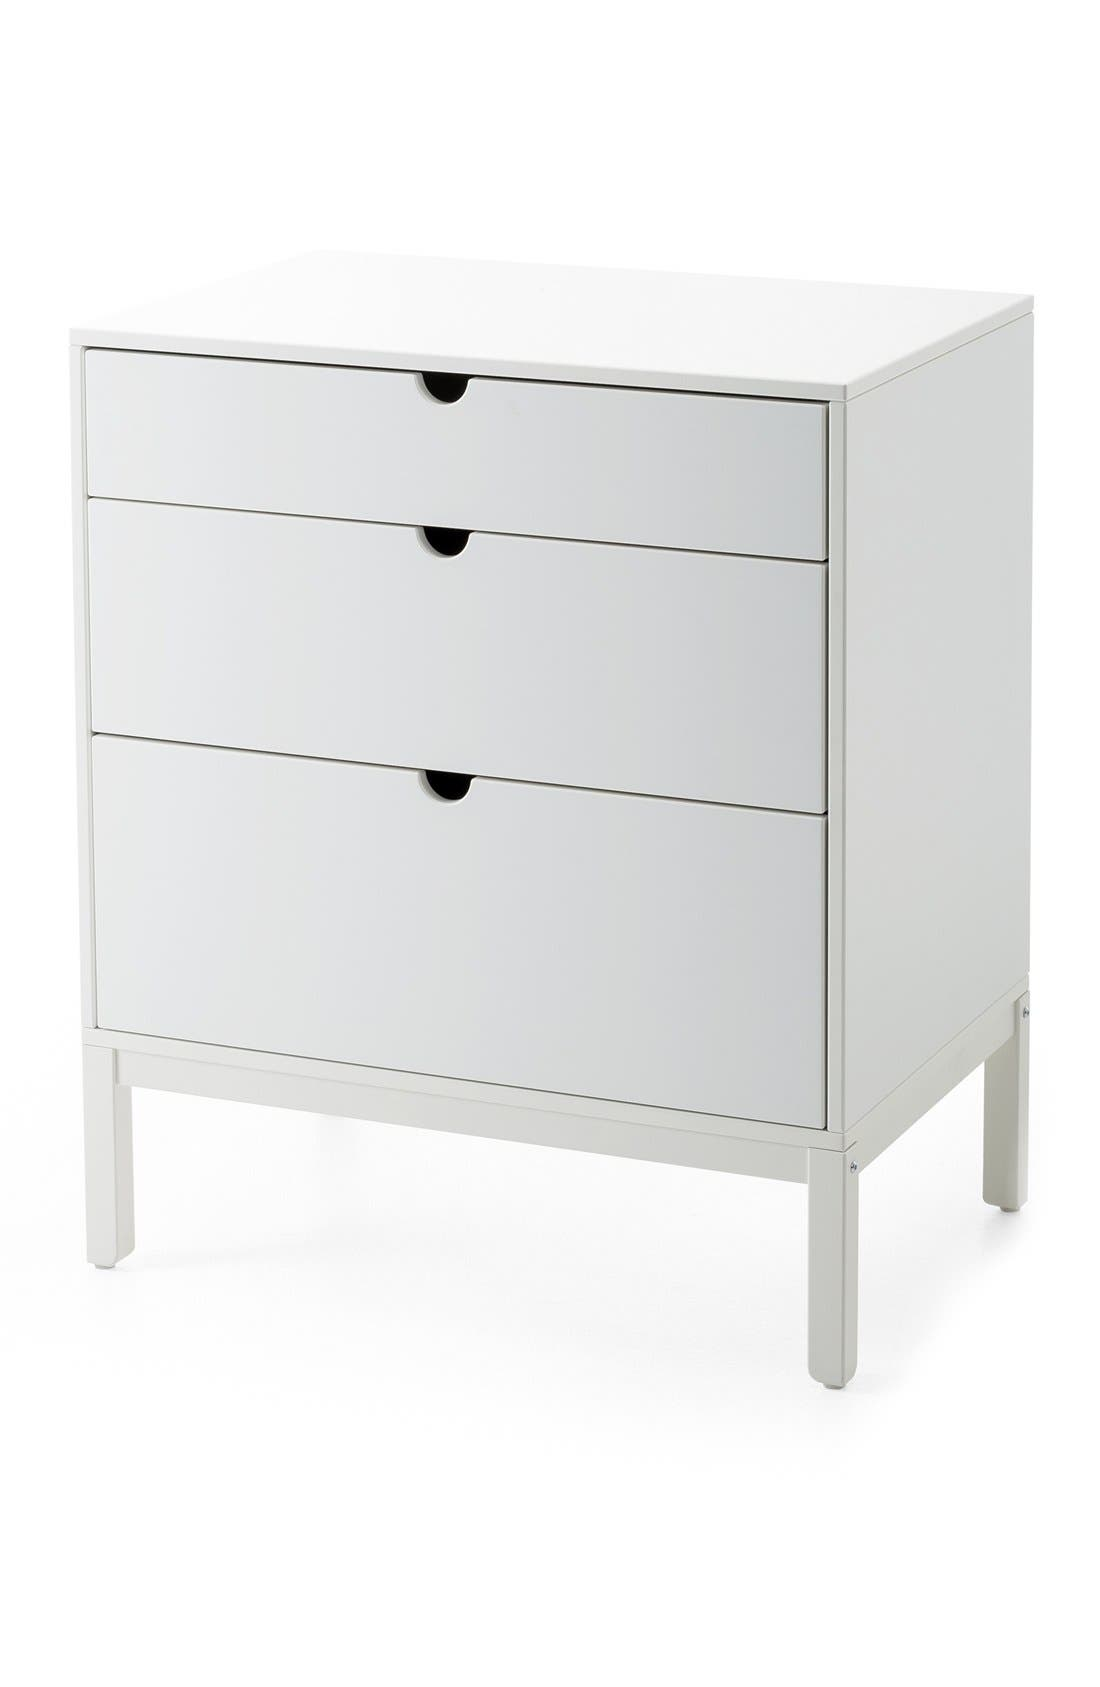 Alternate Image 1 Selected - Stokke 'Home™' Dresser